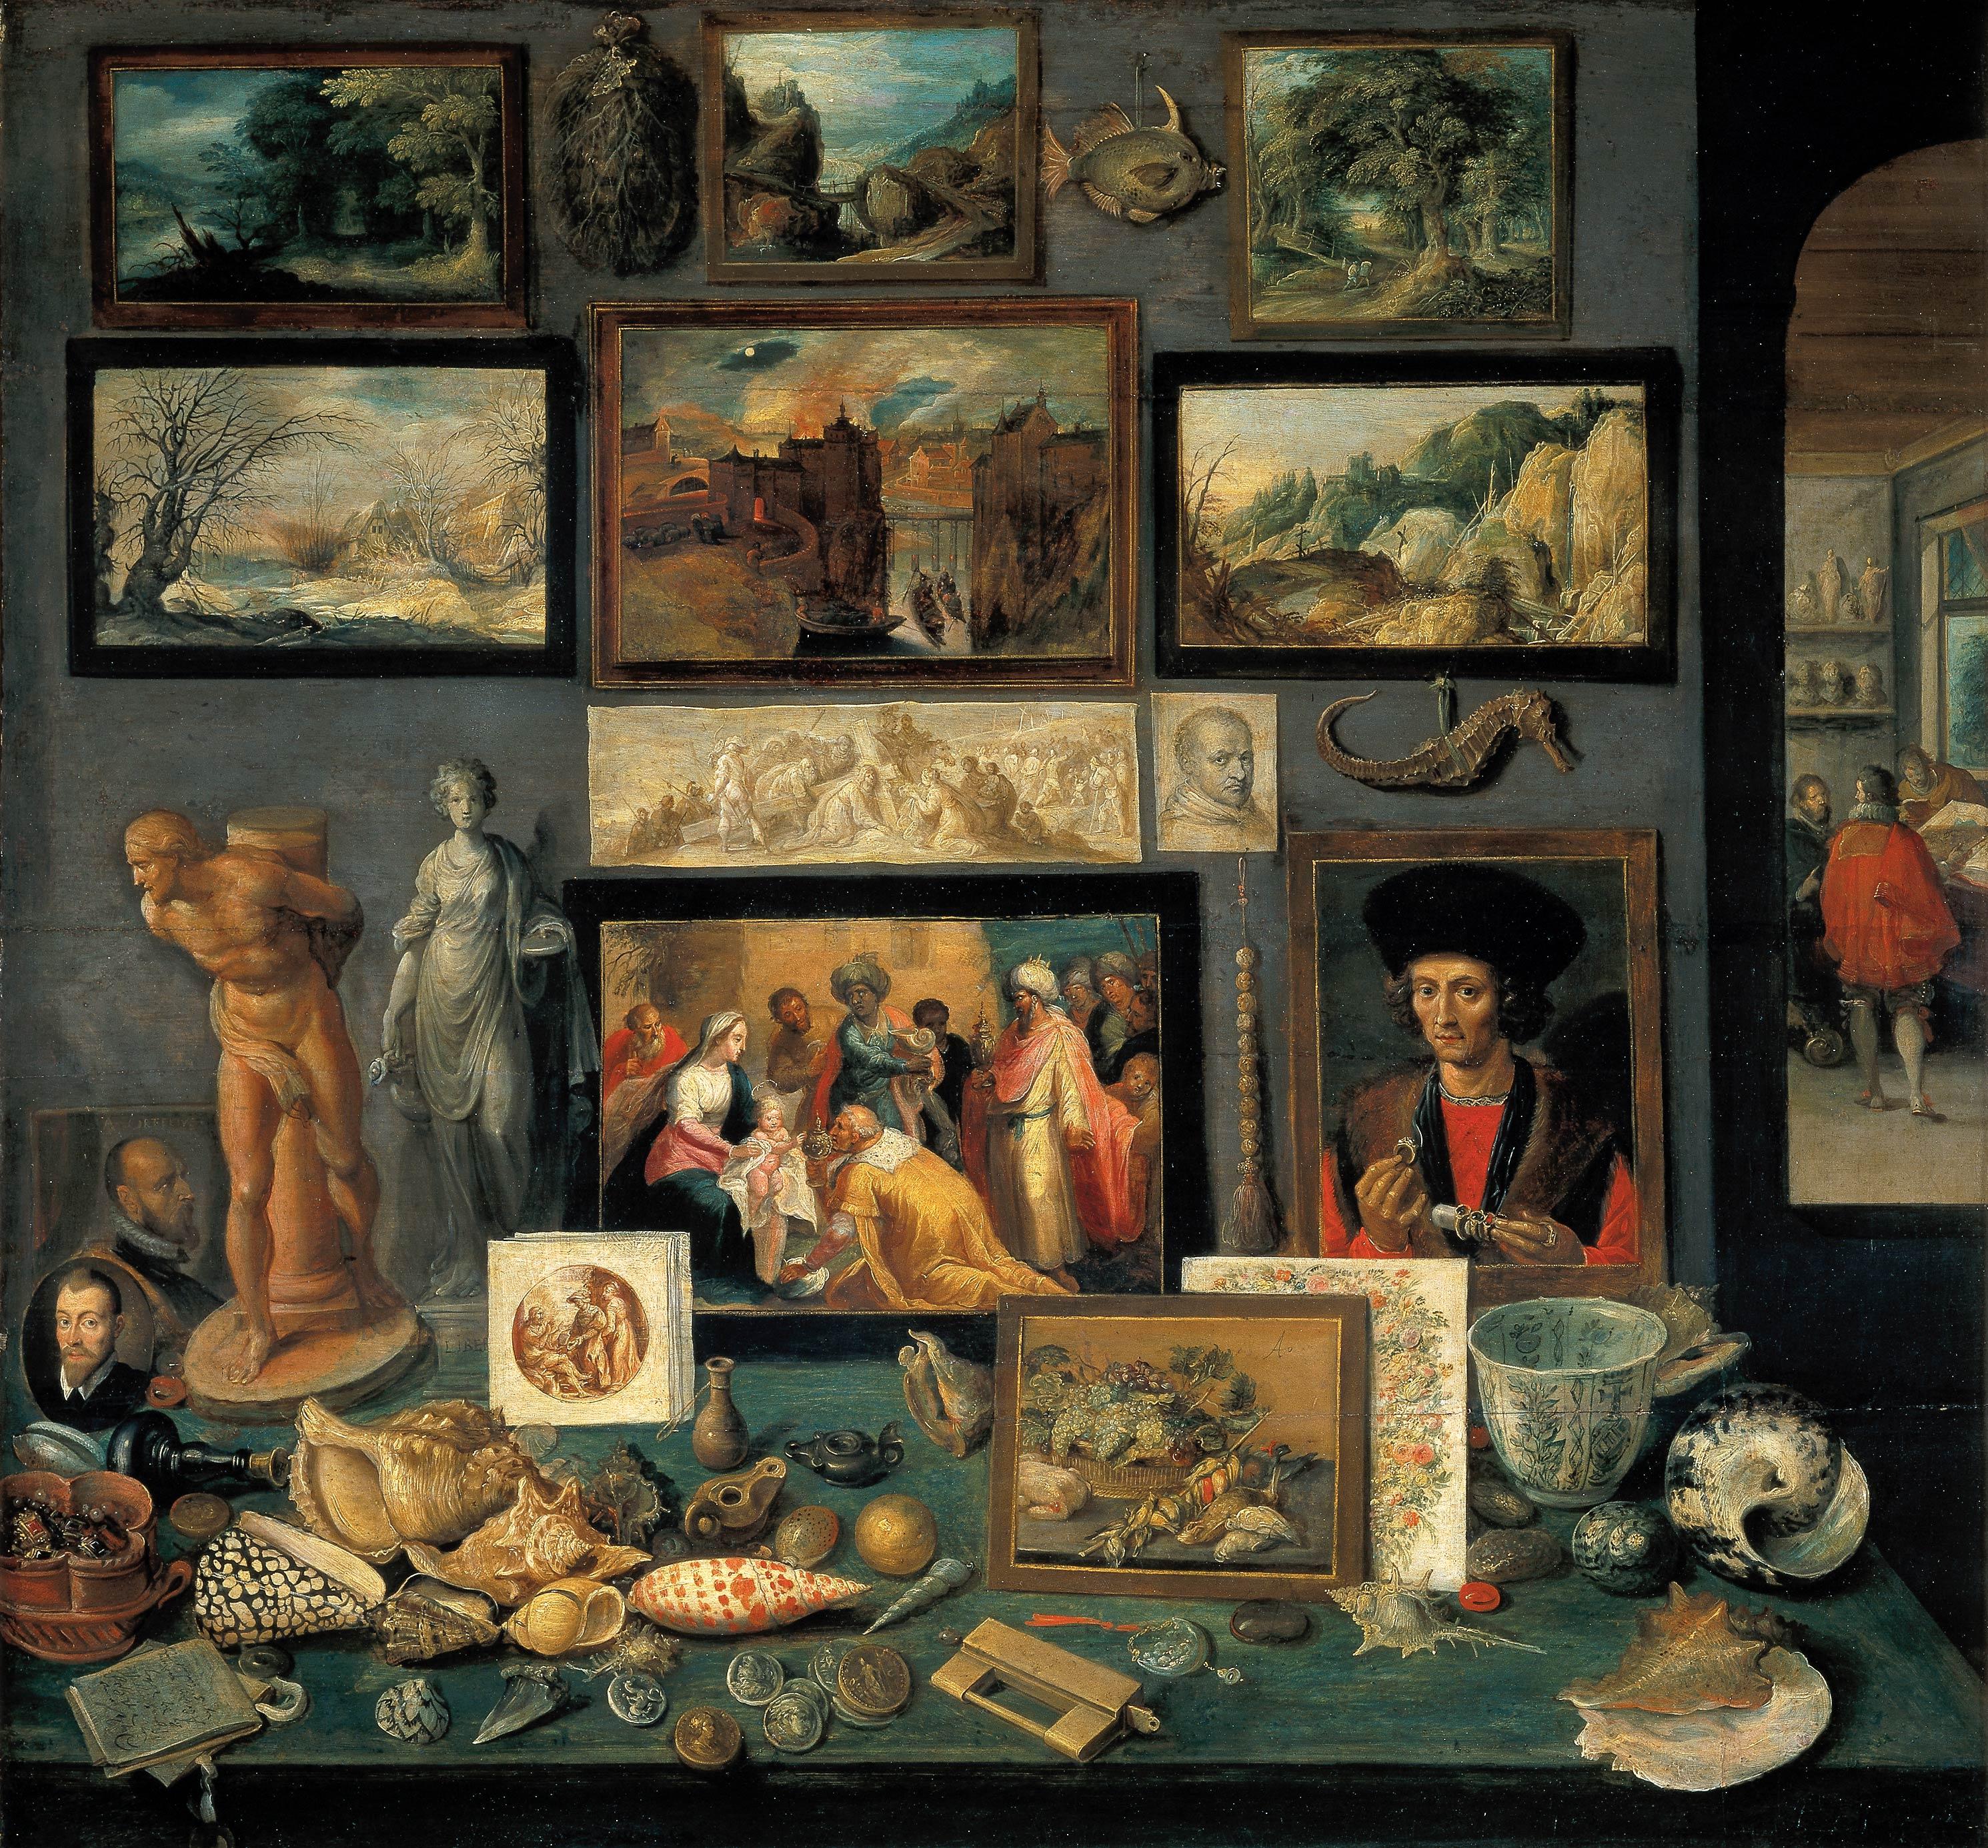 File:Frans Francken (II), Kunst- und Raritätenkammer (1636).